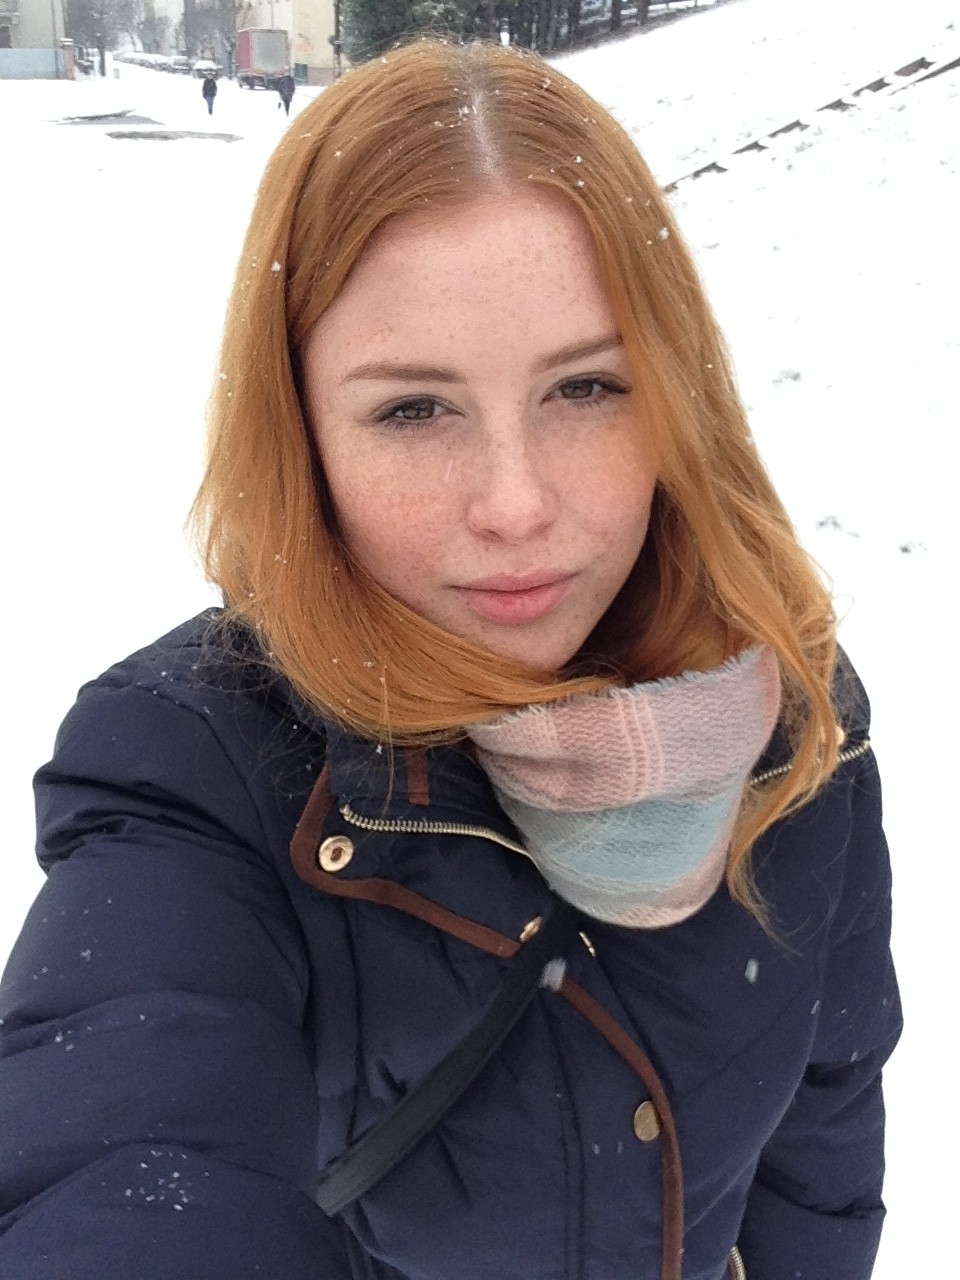 Lenka Regalová redhead freackles snow winter olomouc selfie cityflower